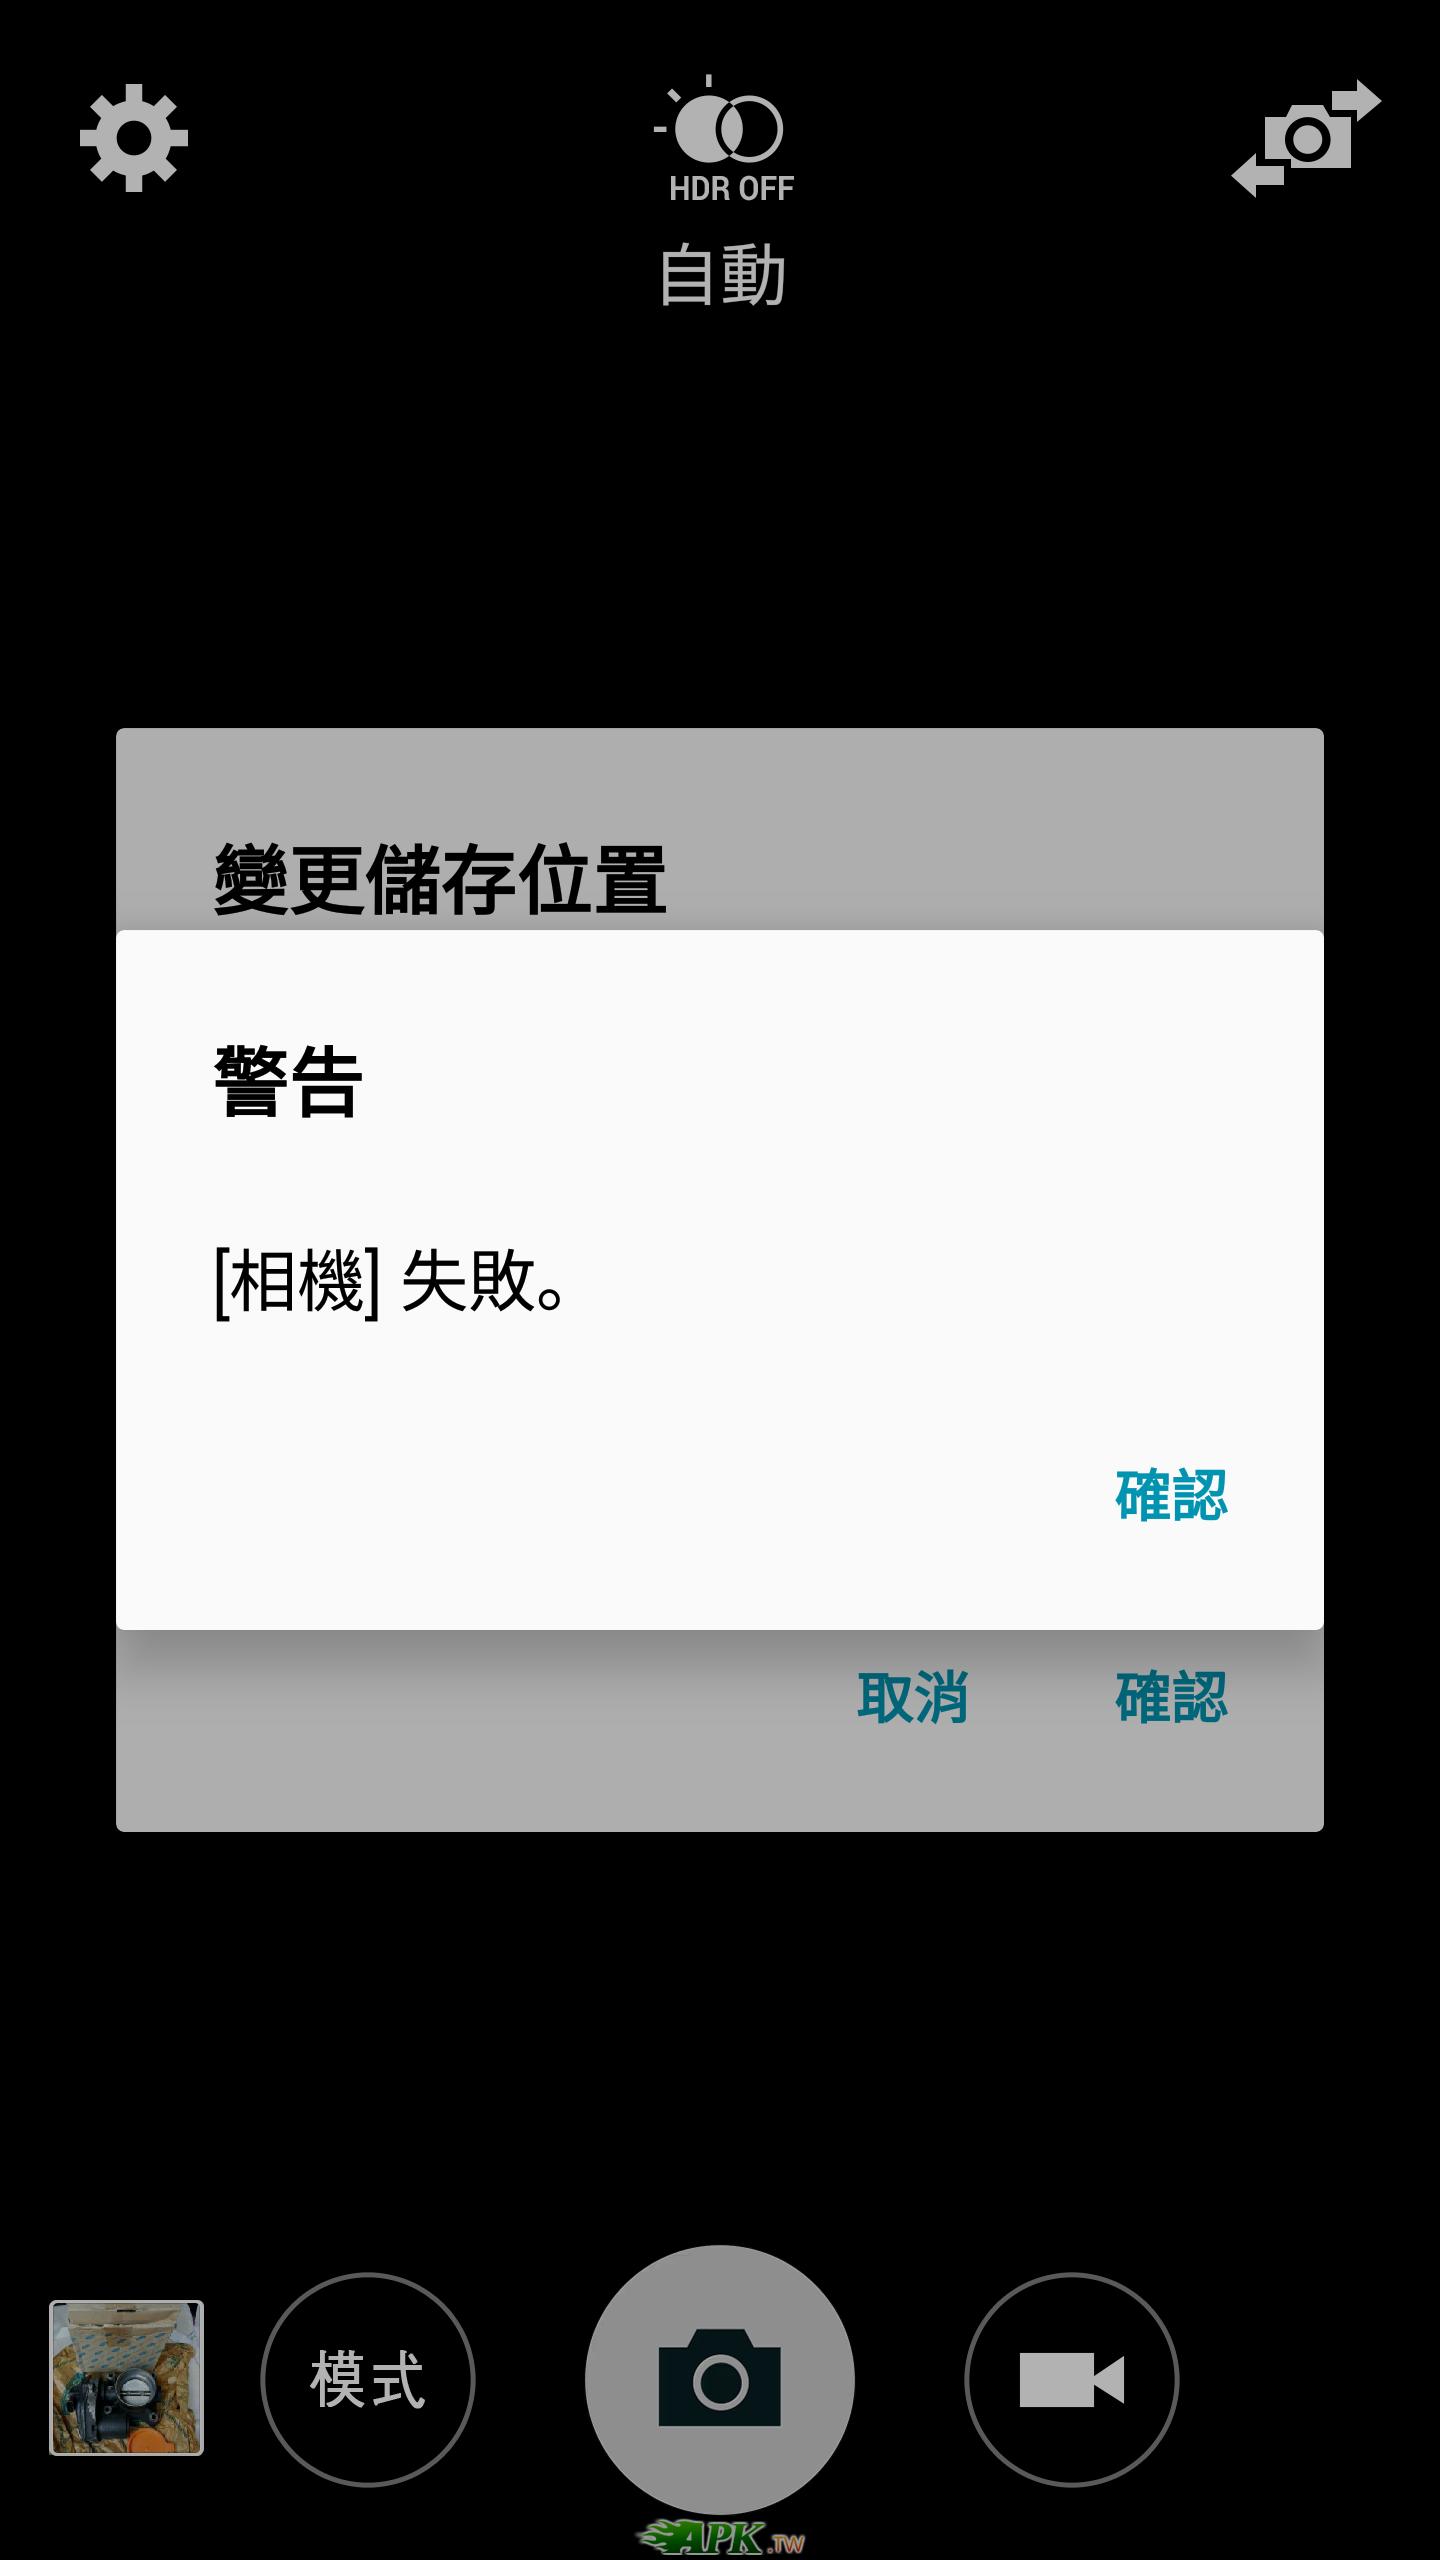 Screenshot_2017-06-27-09-49-55.png